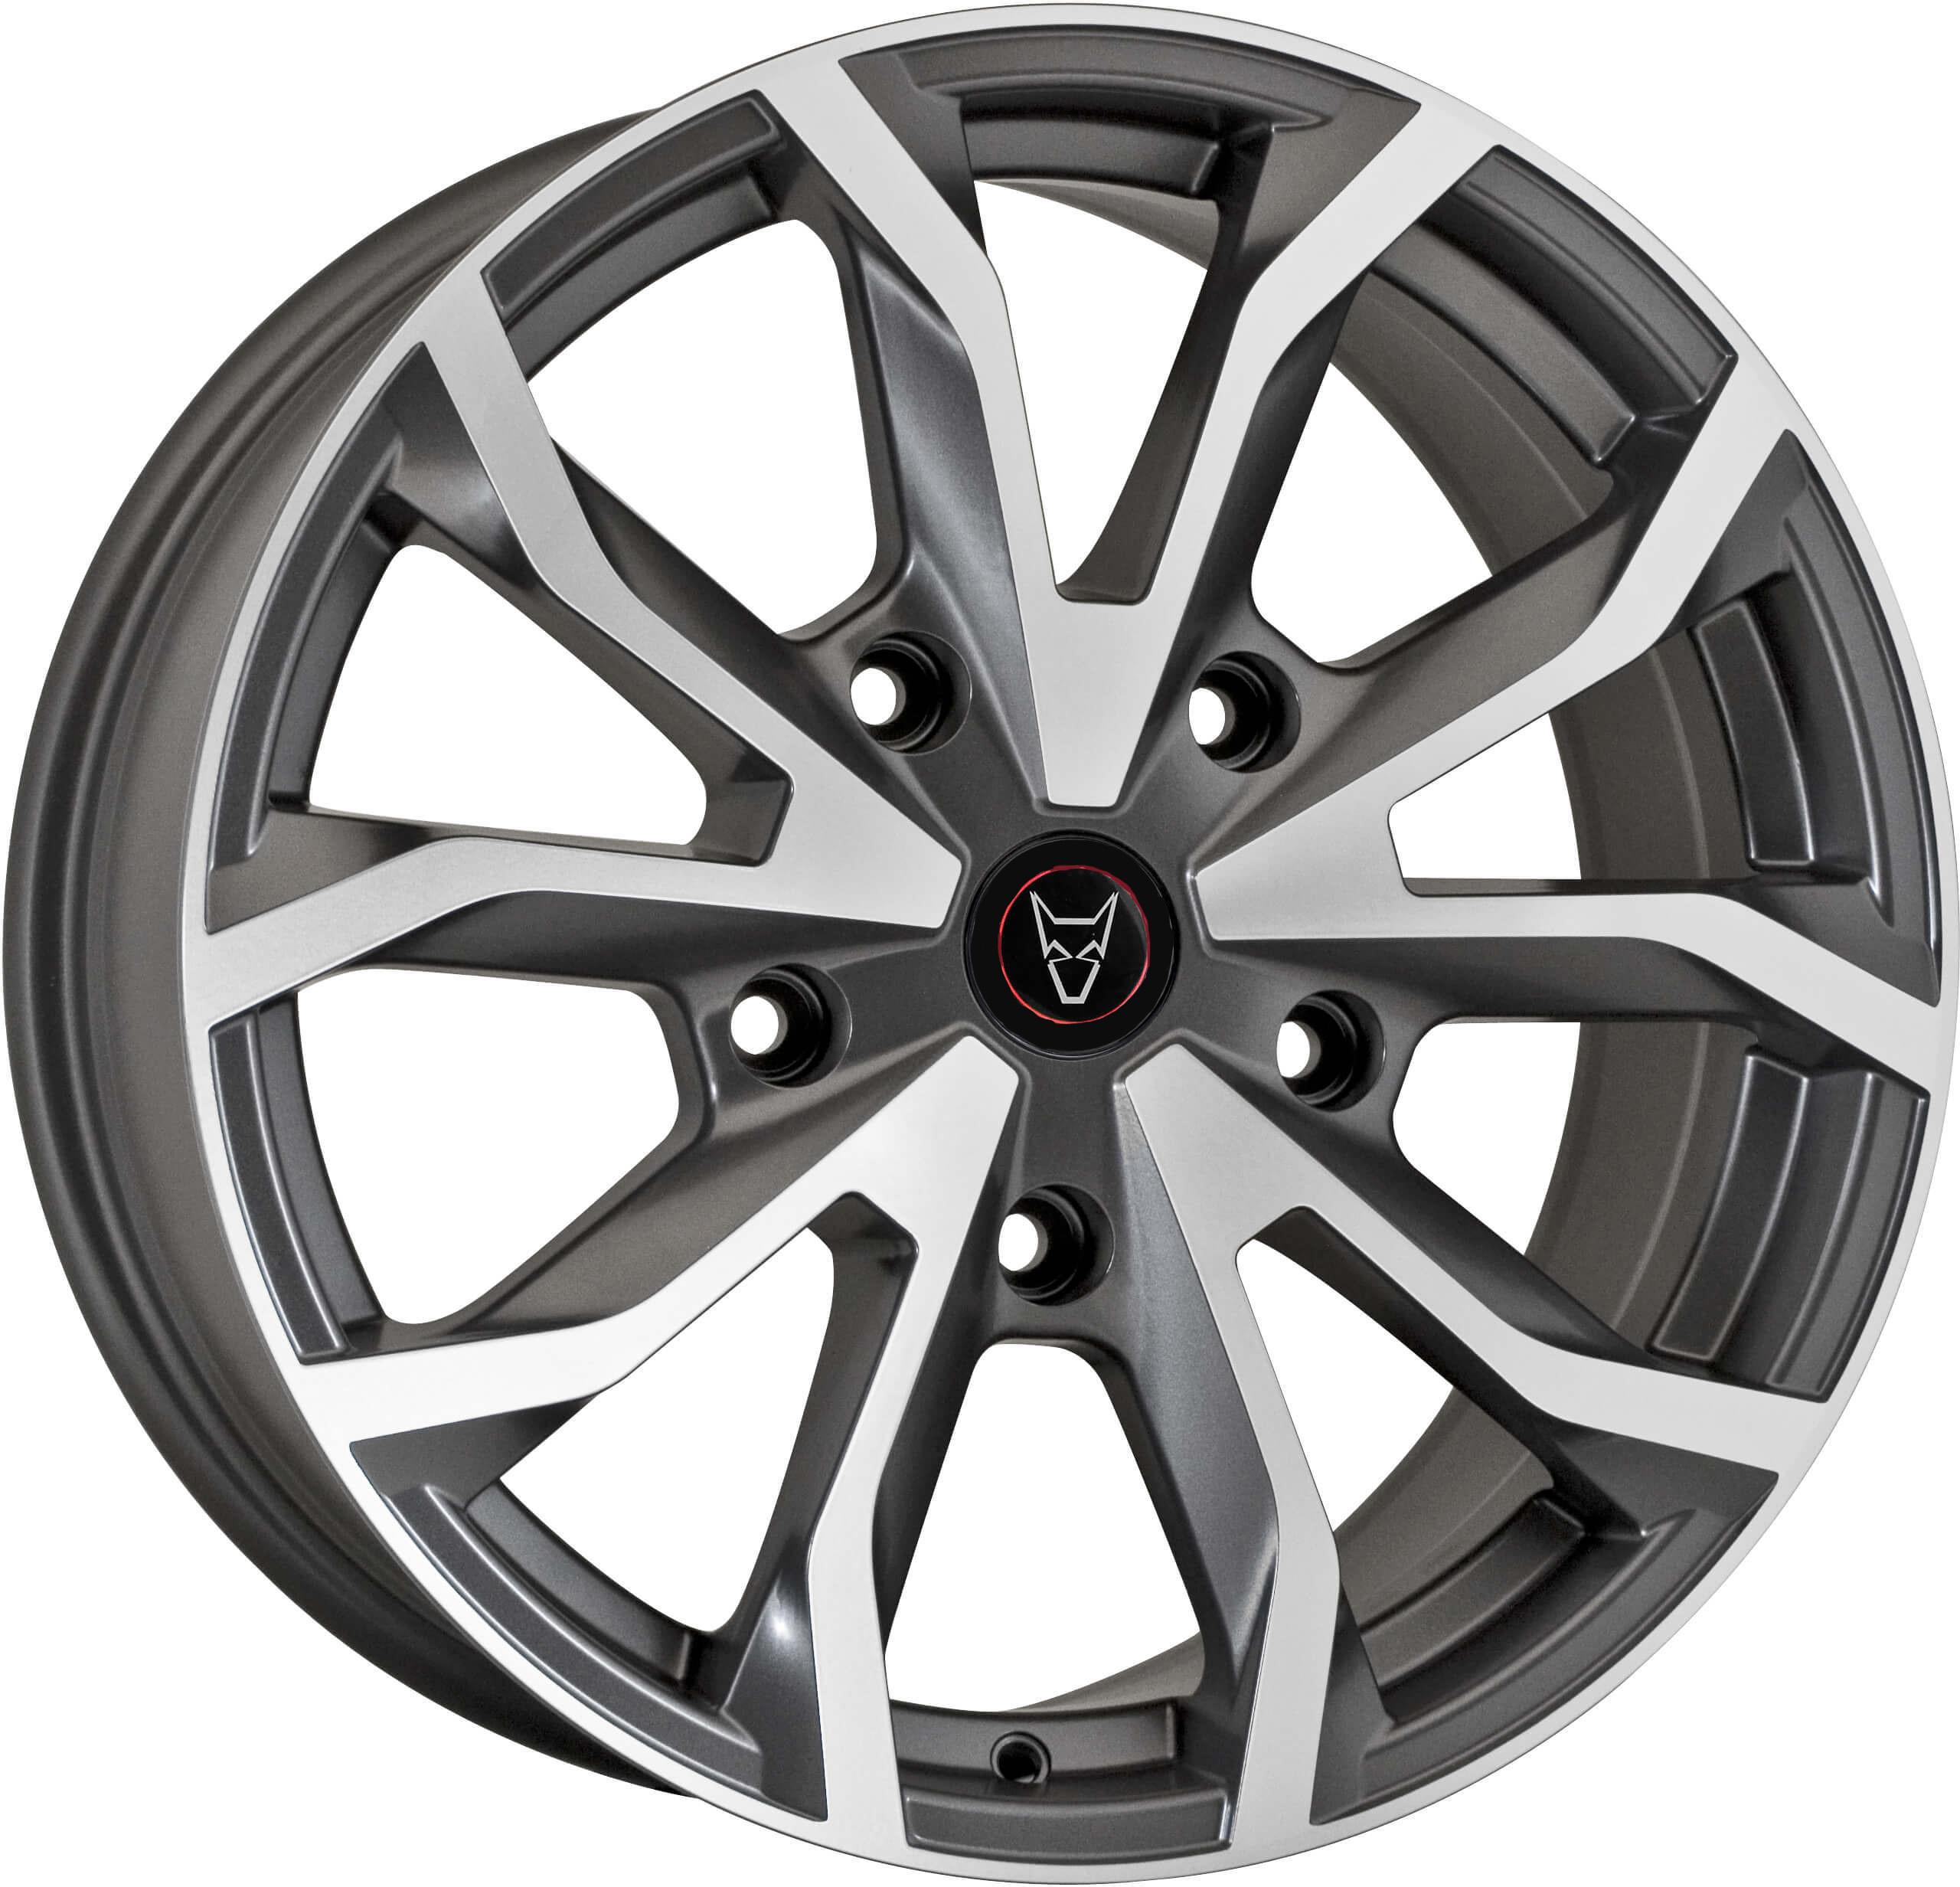 Demon Wheels Eurosport Assassin TRS Gunmetal / Polished